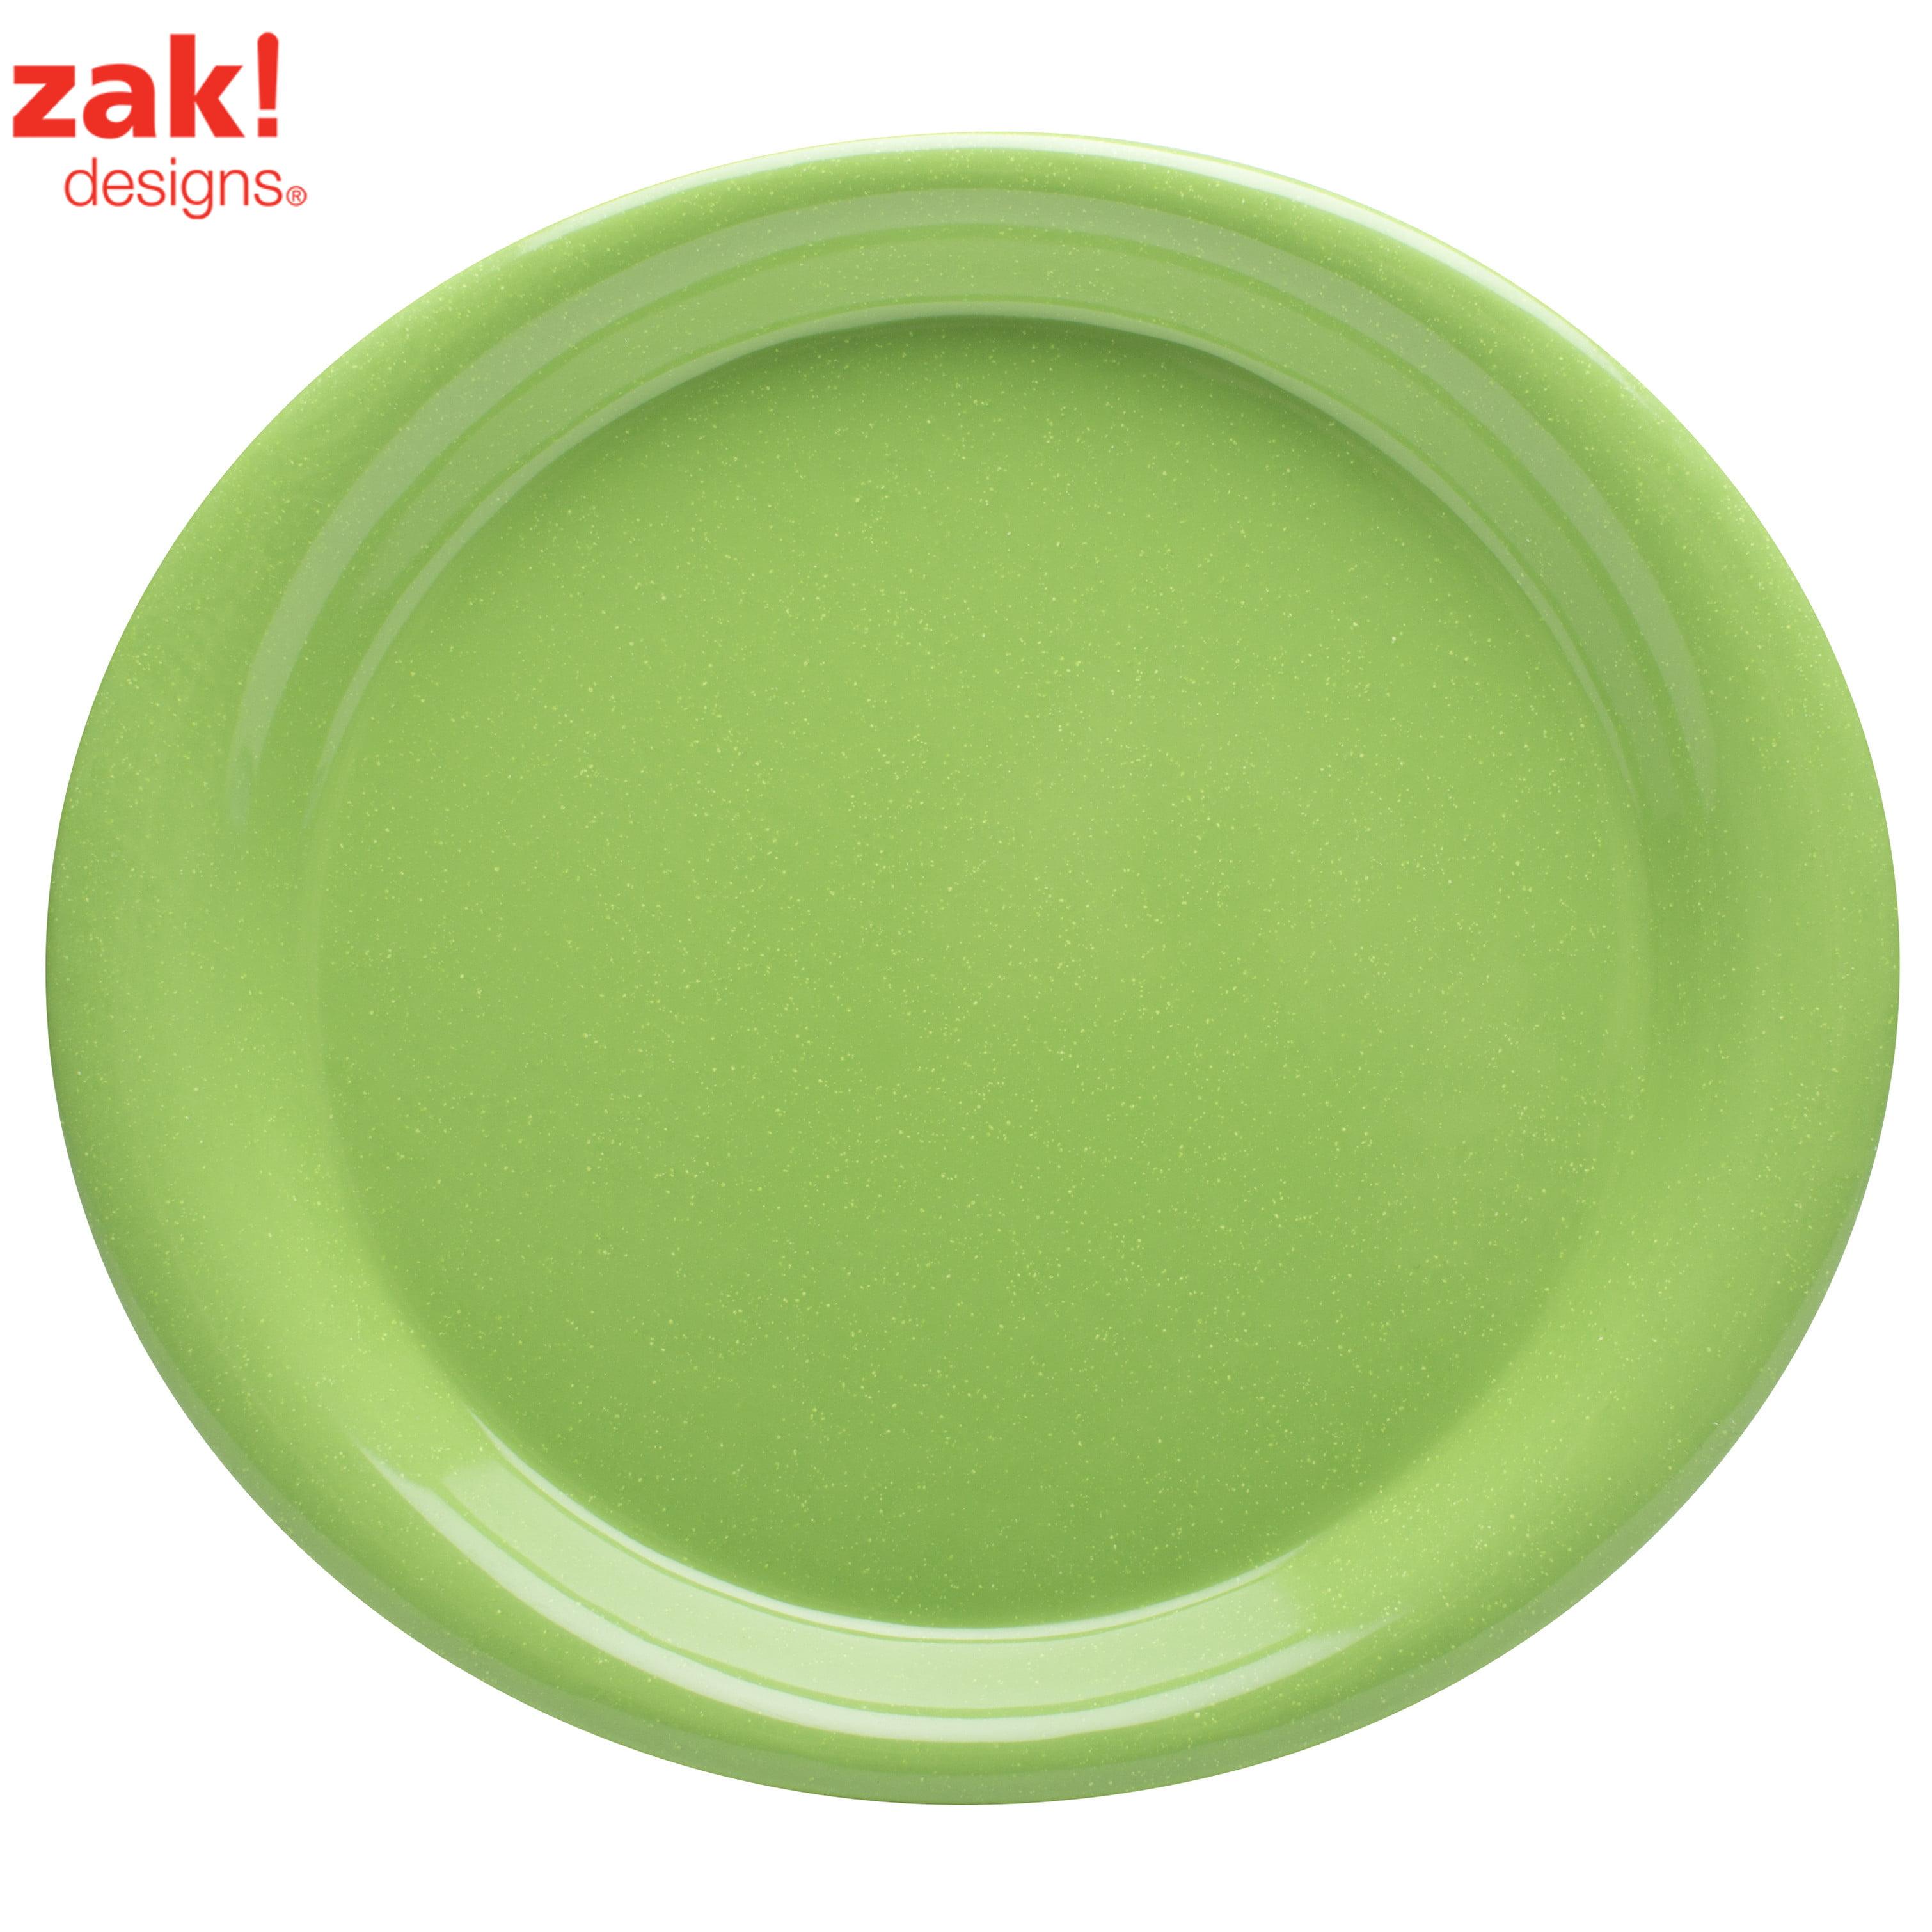 Zak Designs Zakwave Microwave Safe Dinner Plate Palm Green